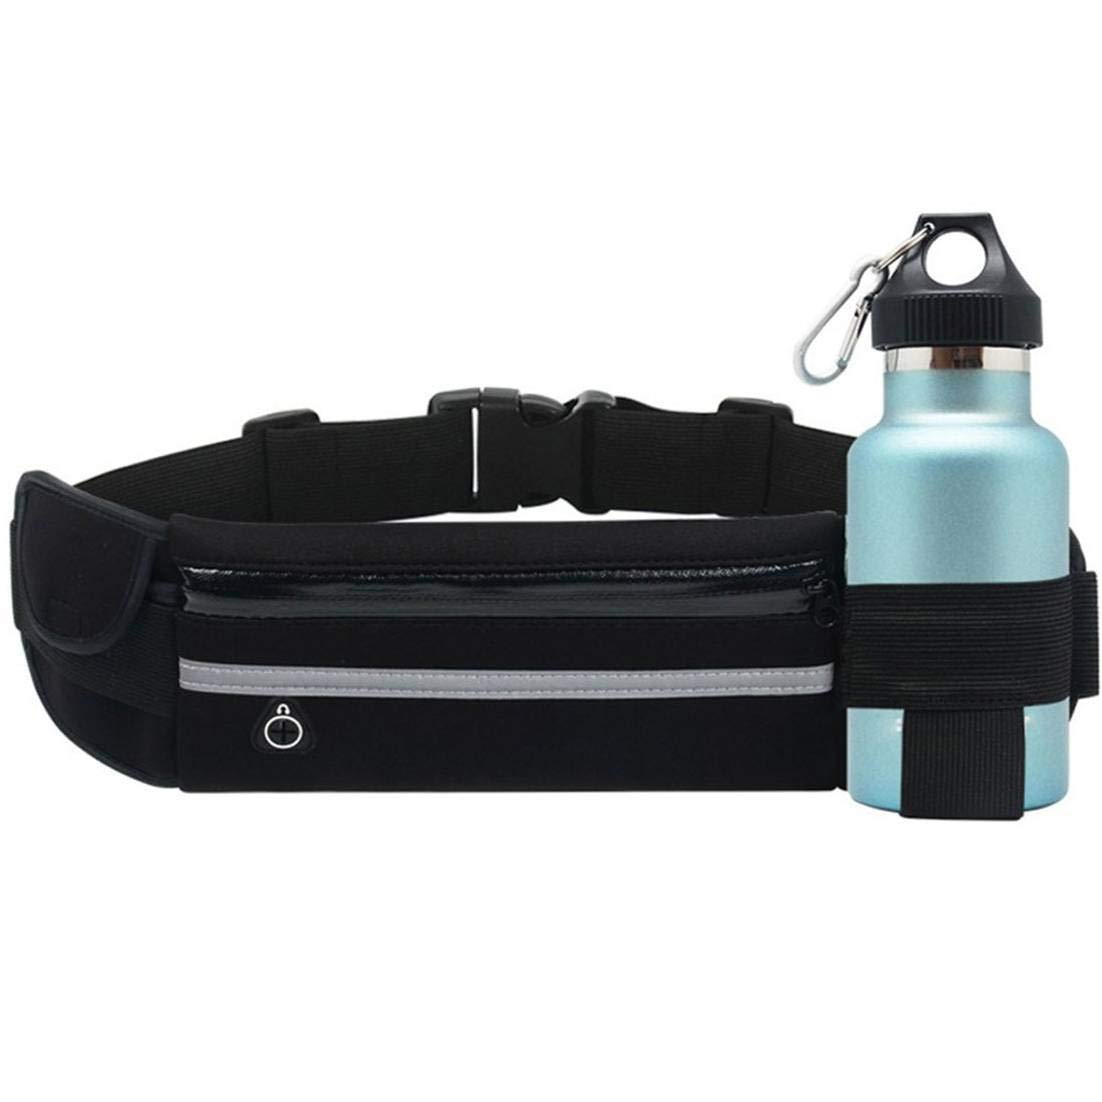 Ri/ñonera Running Compatible con iPhone XS MAX con Banda reflectiva Bolsillos Botella Agua Entrada Auriculares Correa Regulable Transpirable Impermeable antisudor